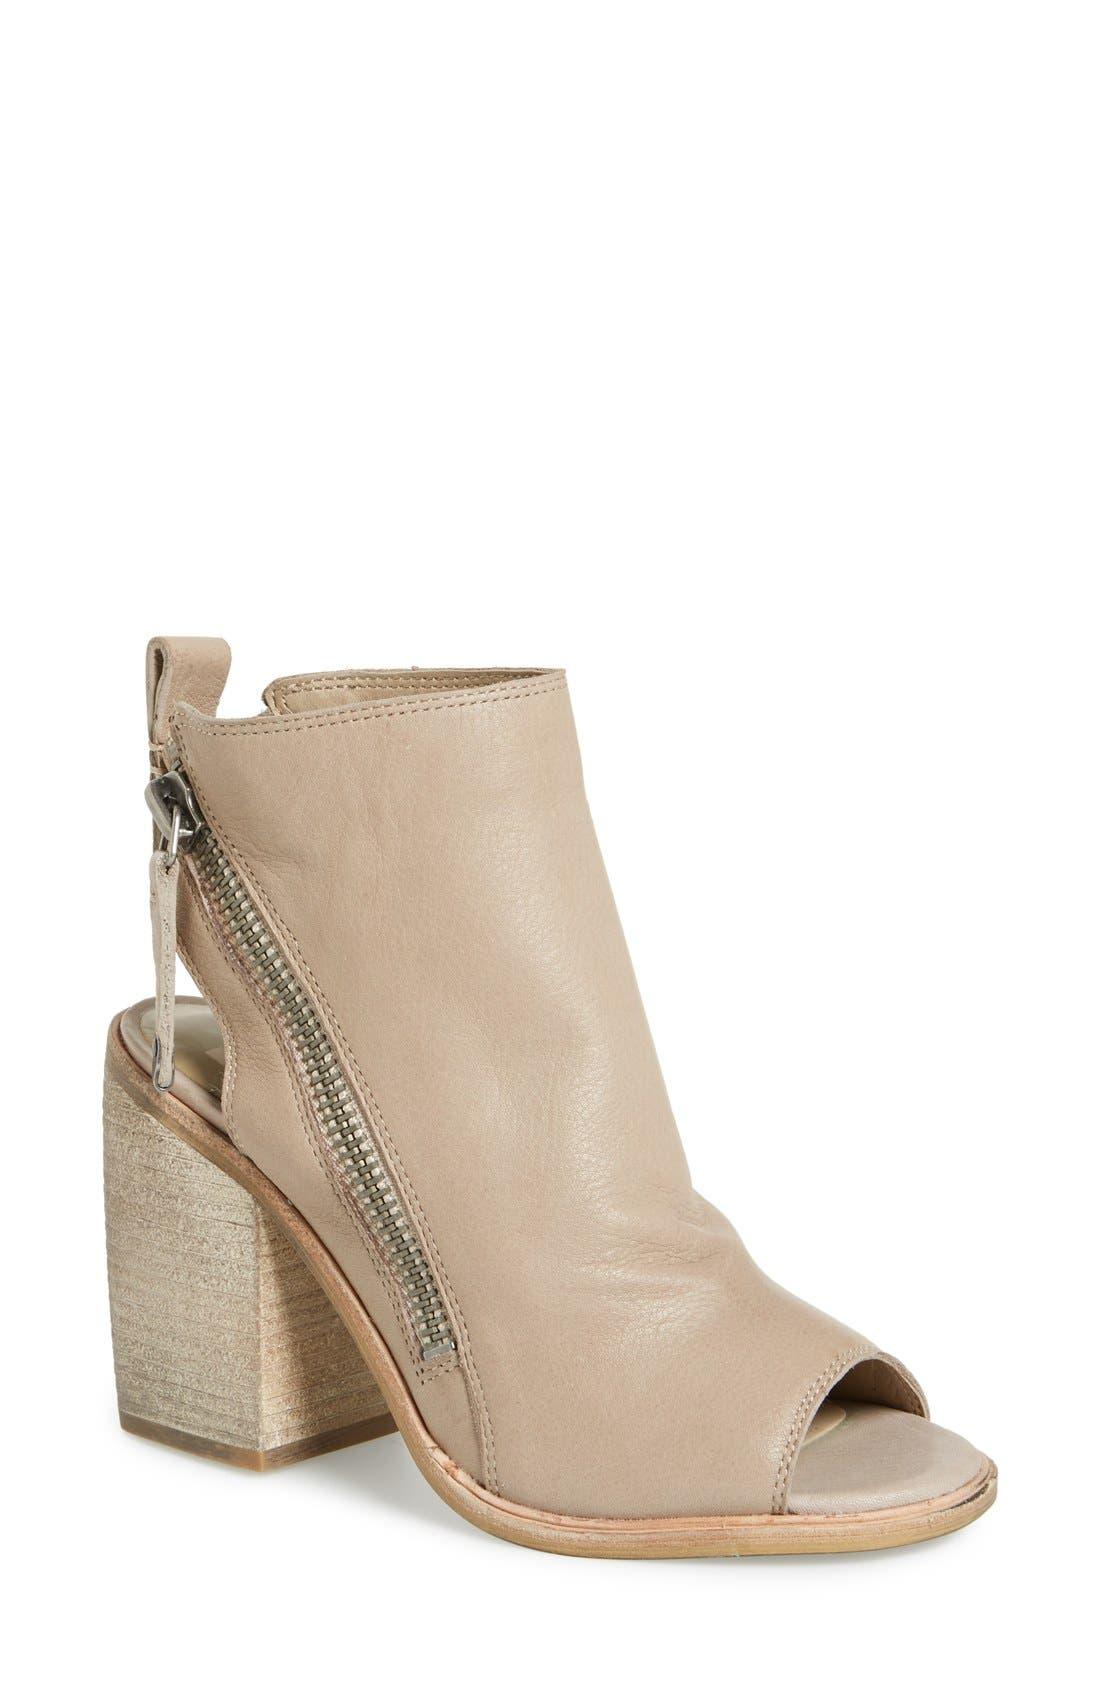 'Port' Open Toe Bootie,                         Main,                         color, Almond Leather